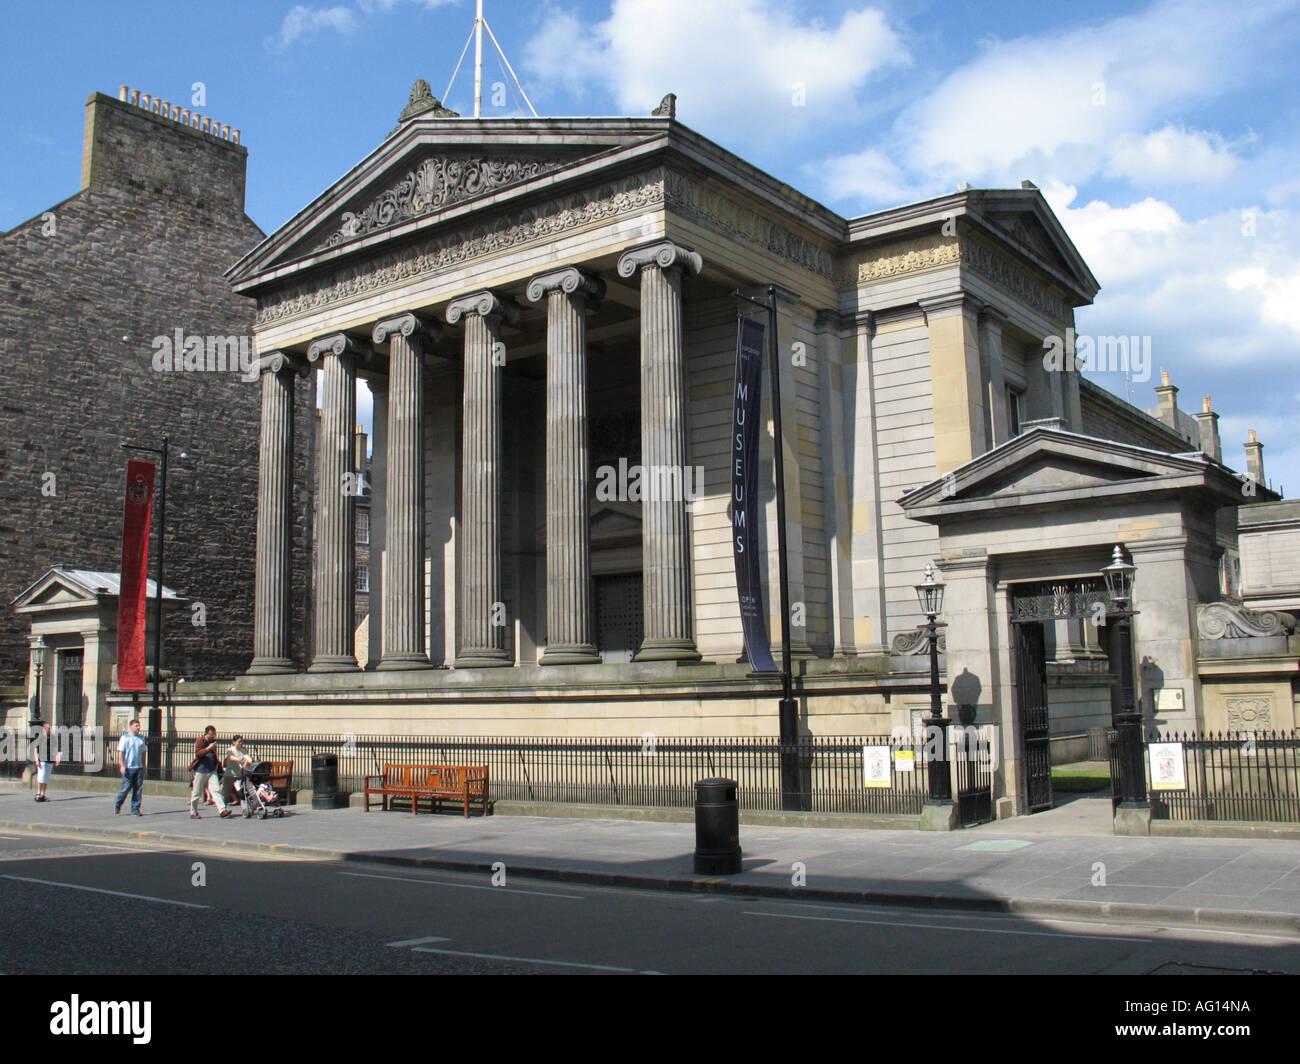 Royal College of Surgeons on Nicholson Street, Edinburgh, Scotland, UK. - Stock Image